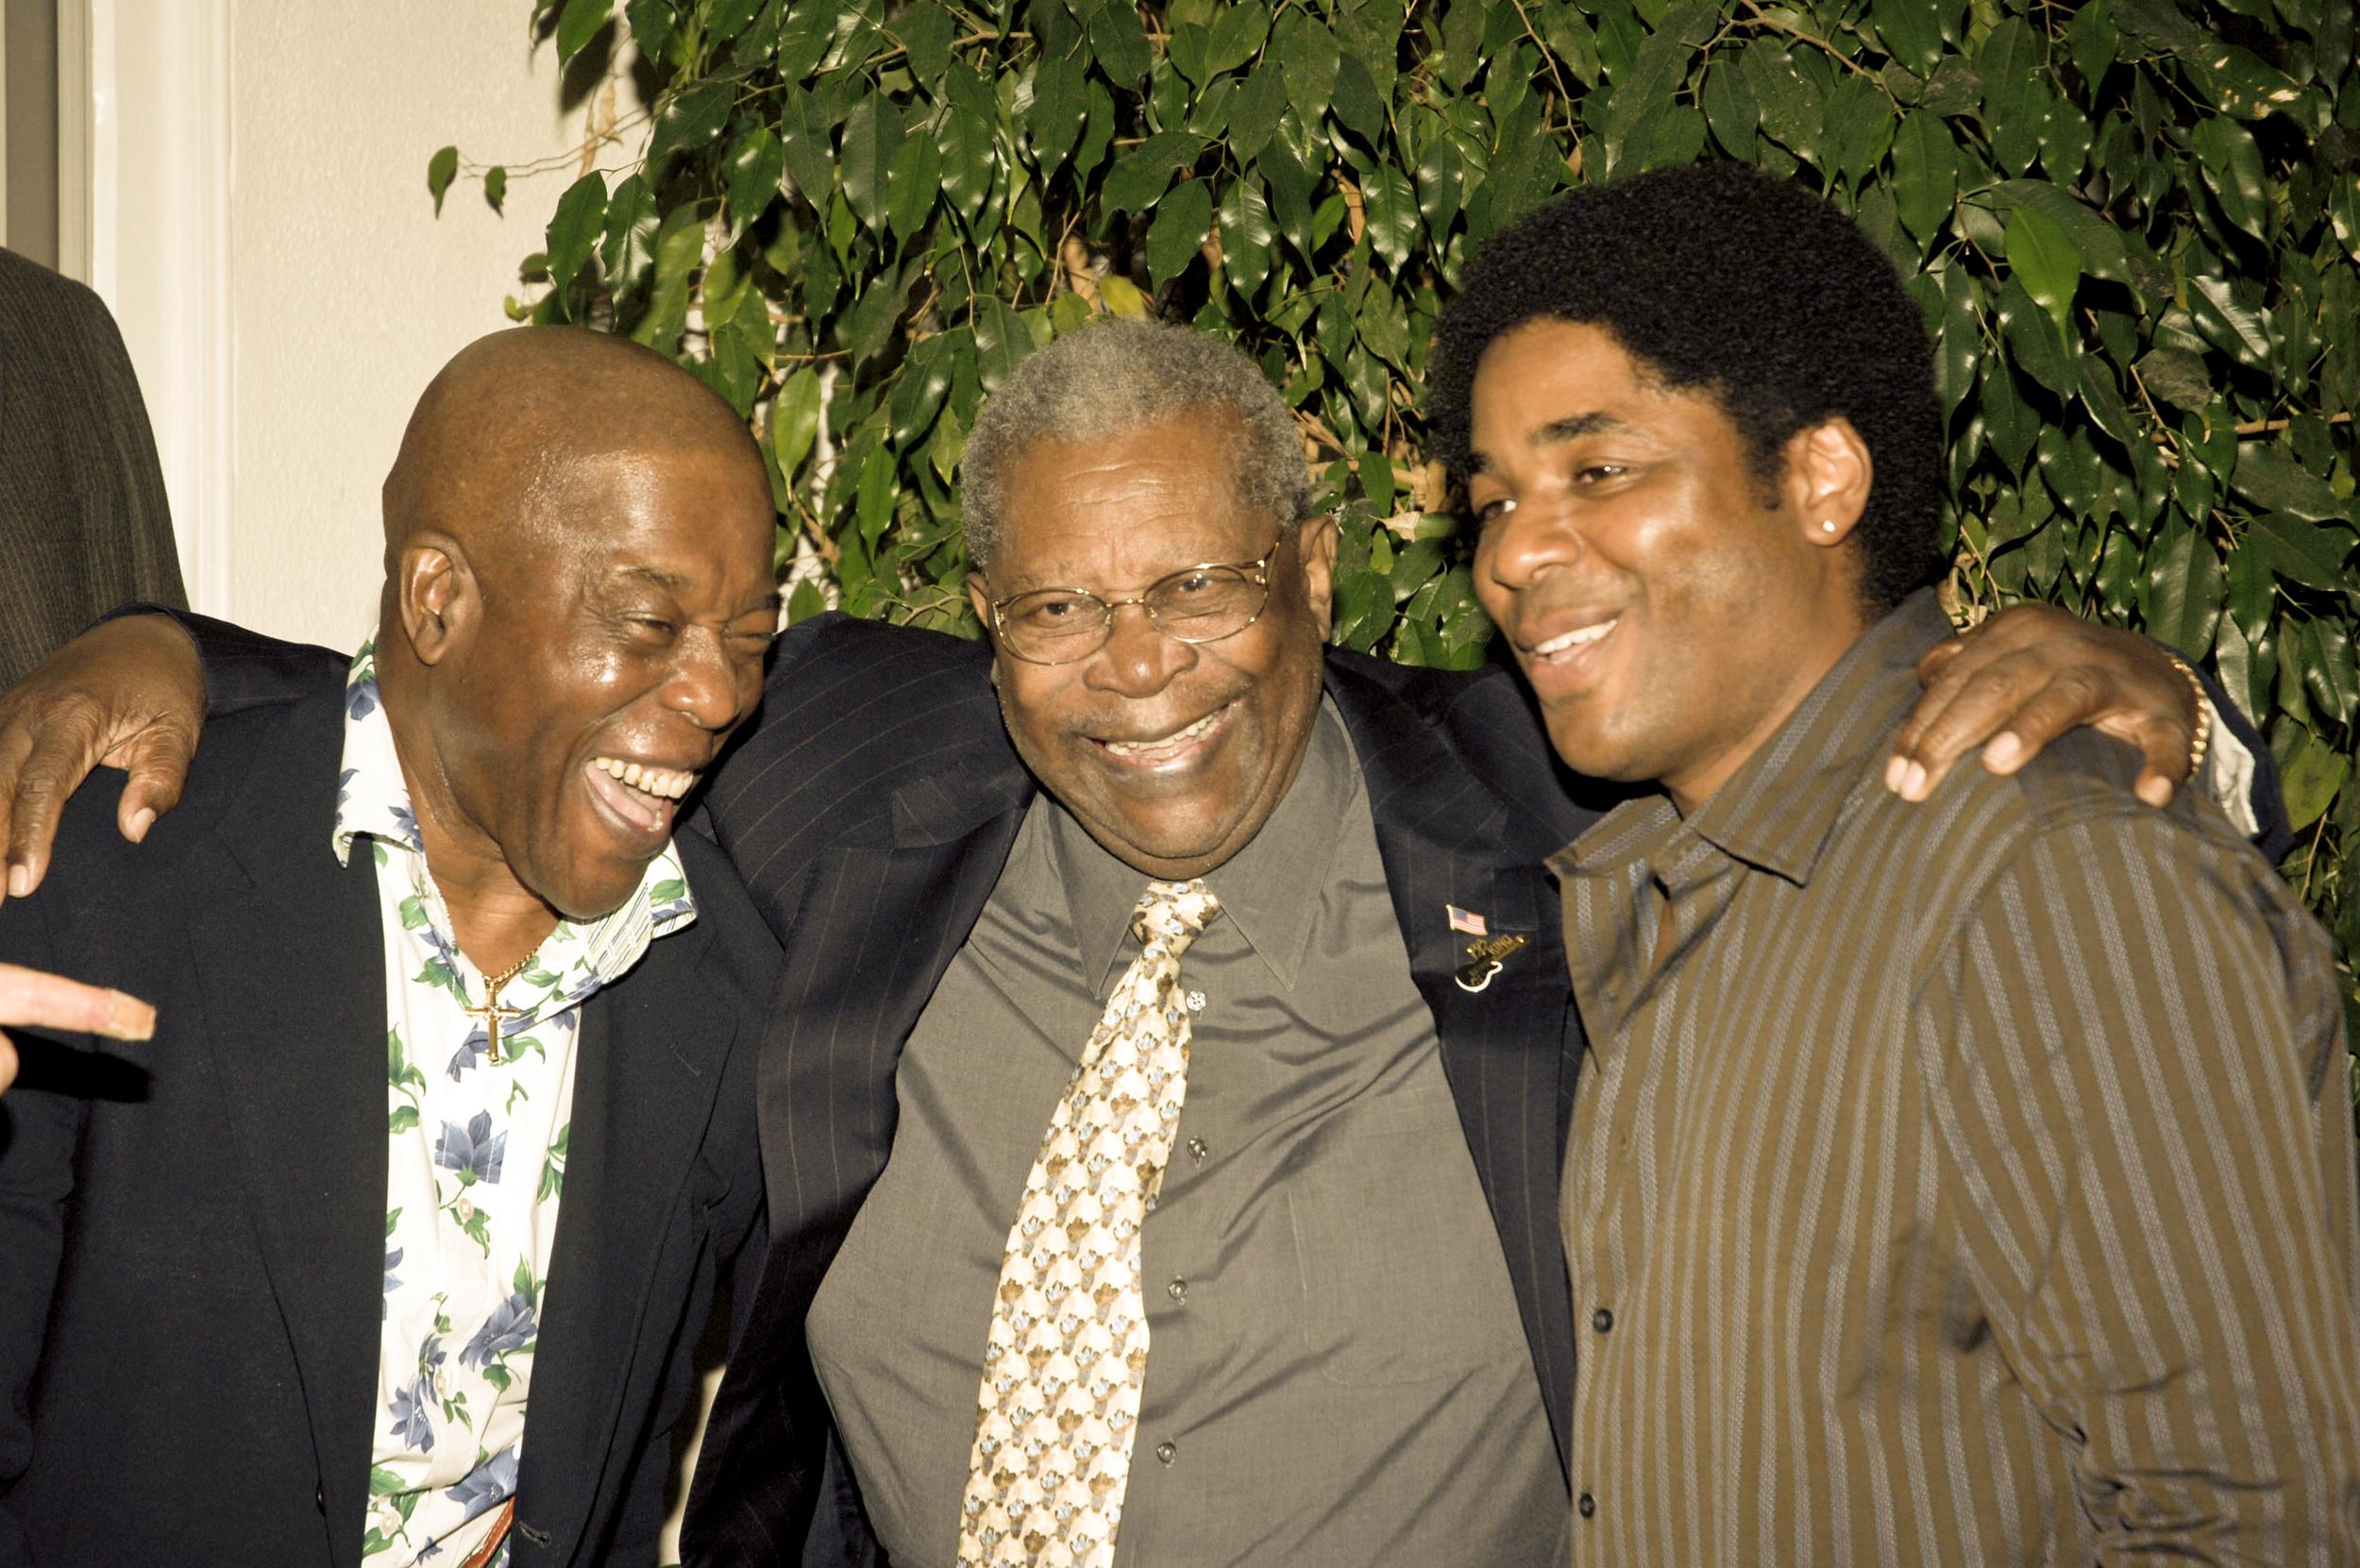 Buddy Guy, B.B. King and Chris Thomas King Los Angeles 2005.Photo by John Heller